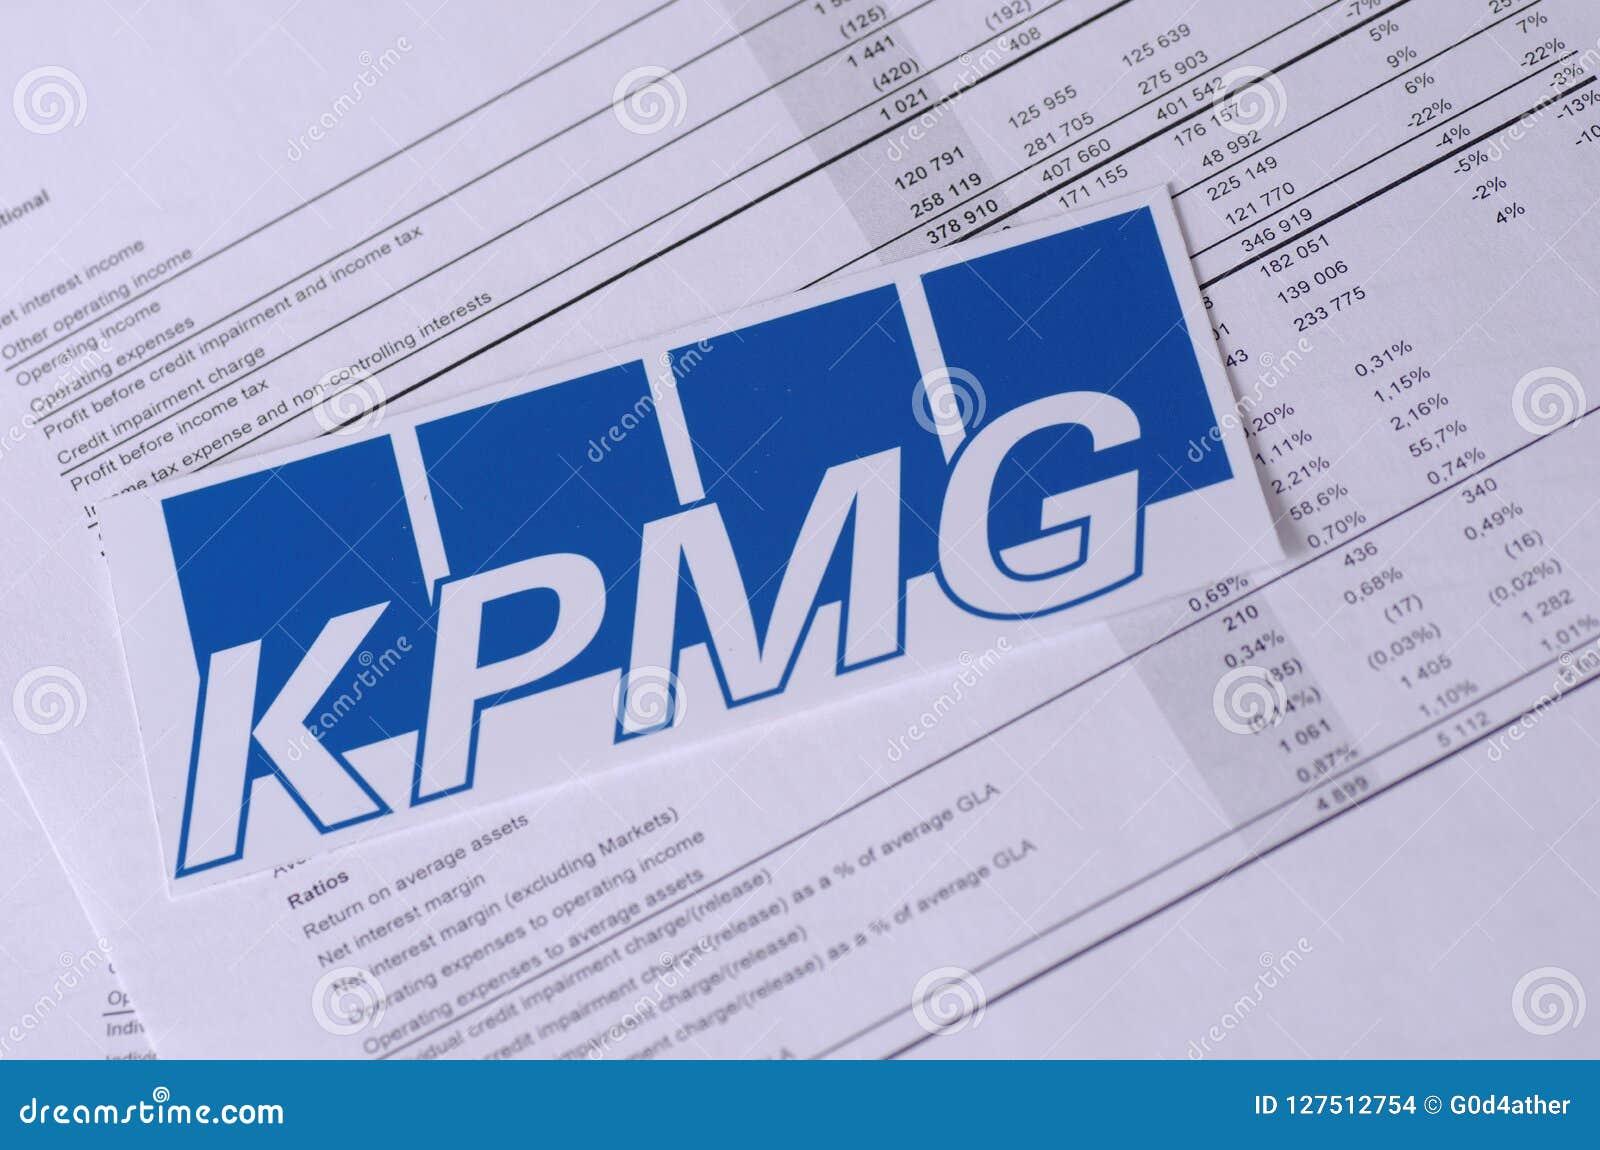 KPMG editorial stock image  Image of balance, consulting